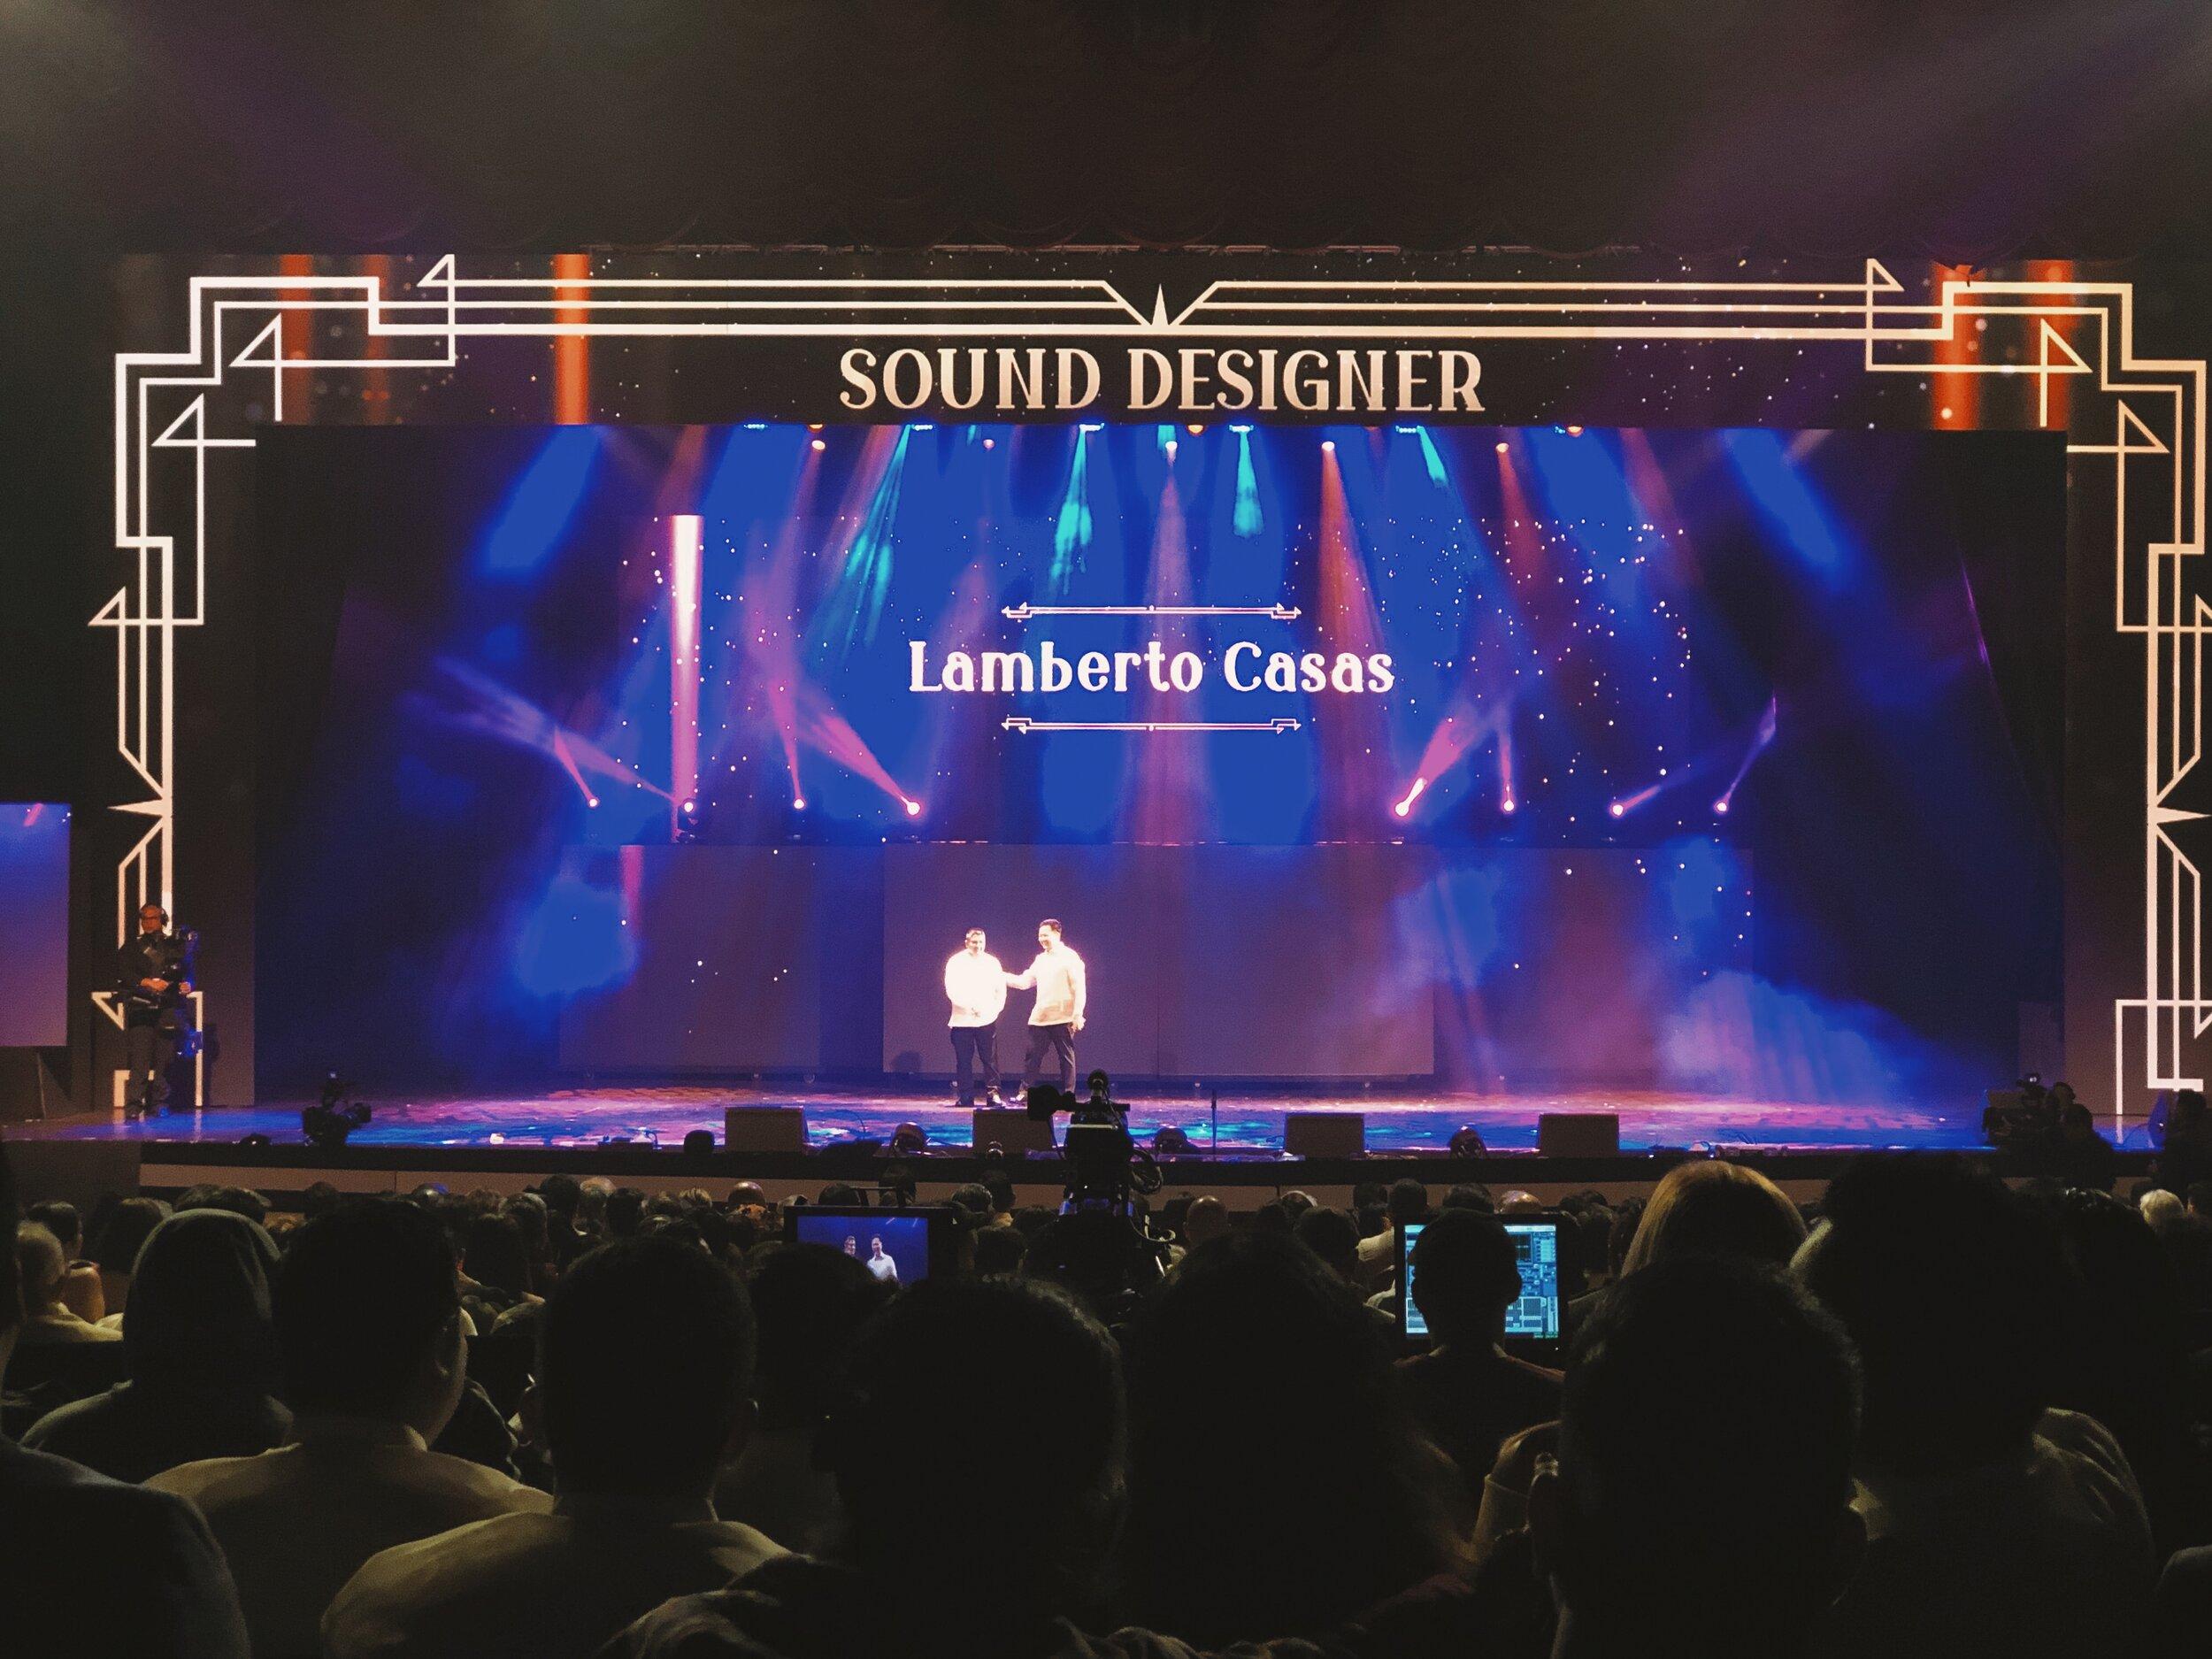 Lamberto Casas receiving the Sine Sandaan Luminary Award.